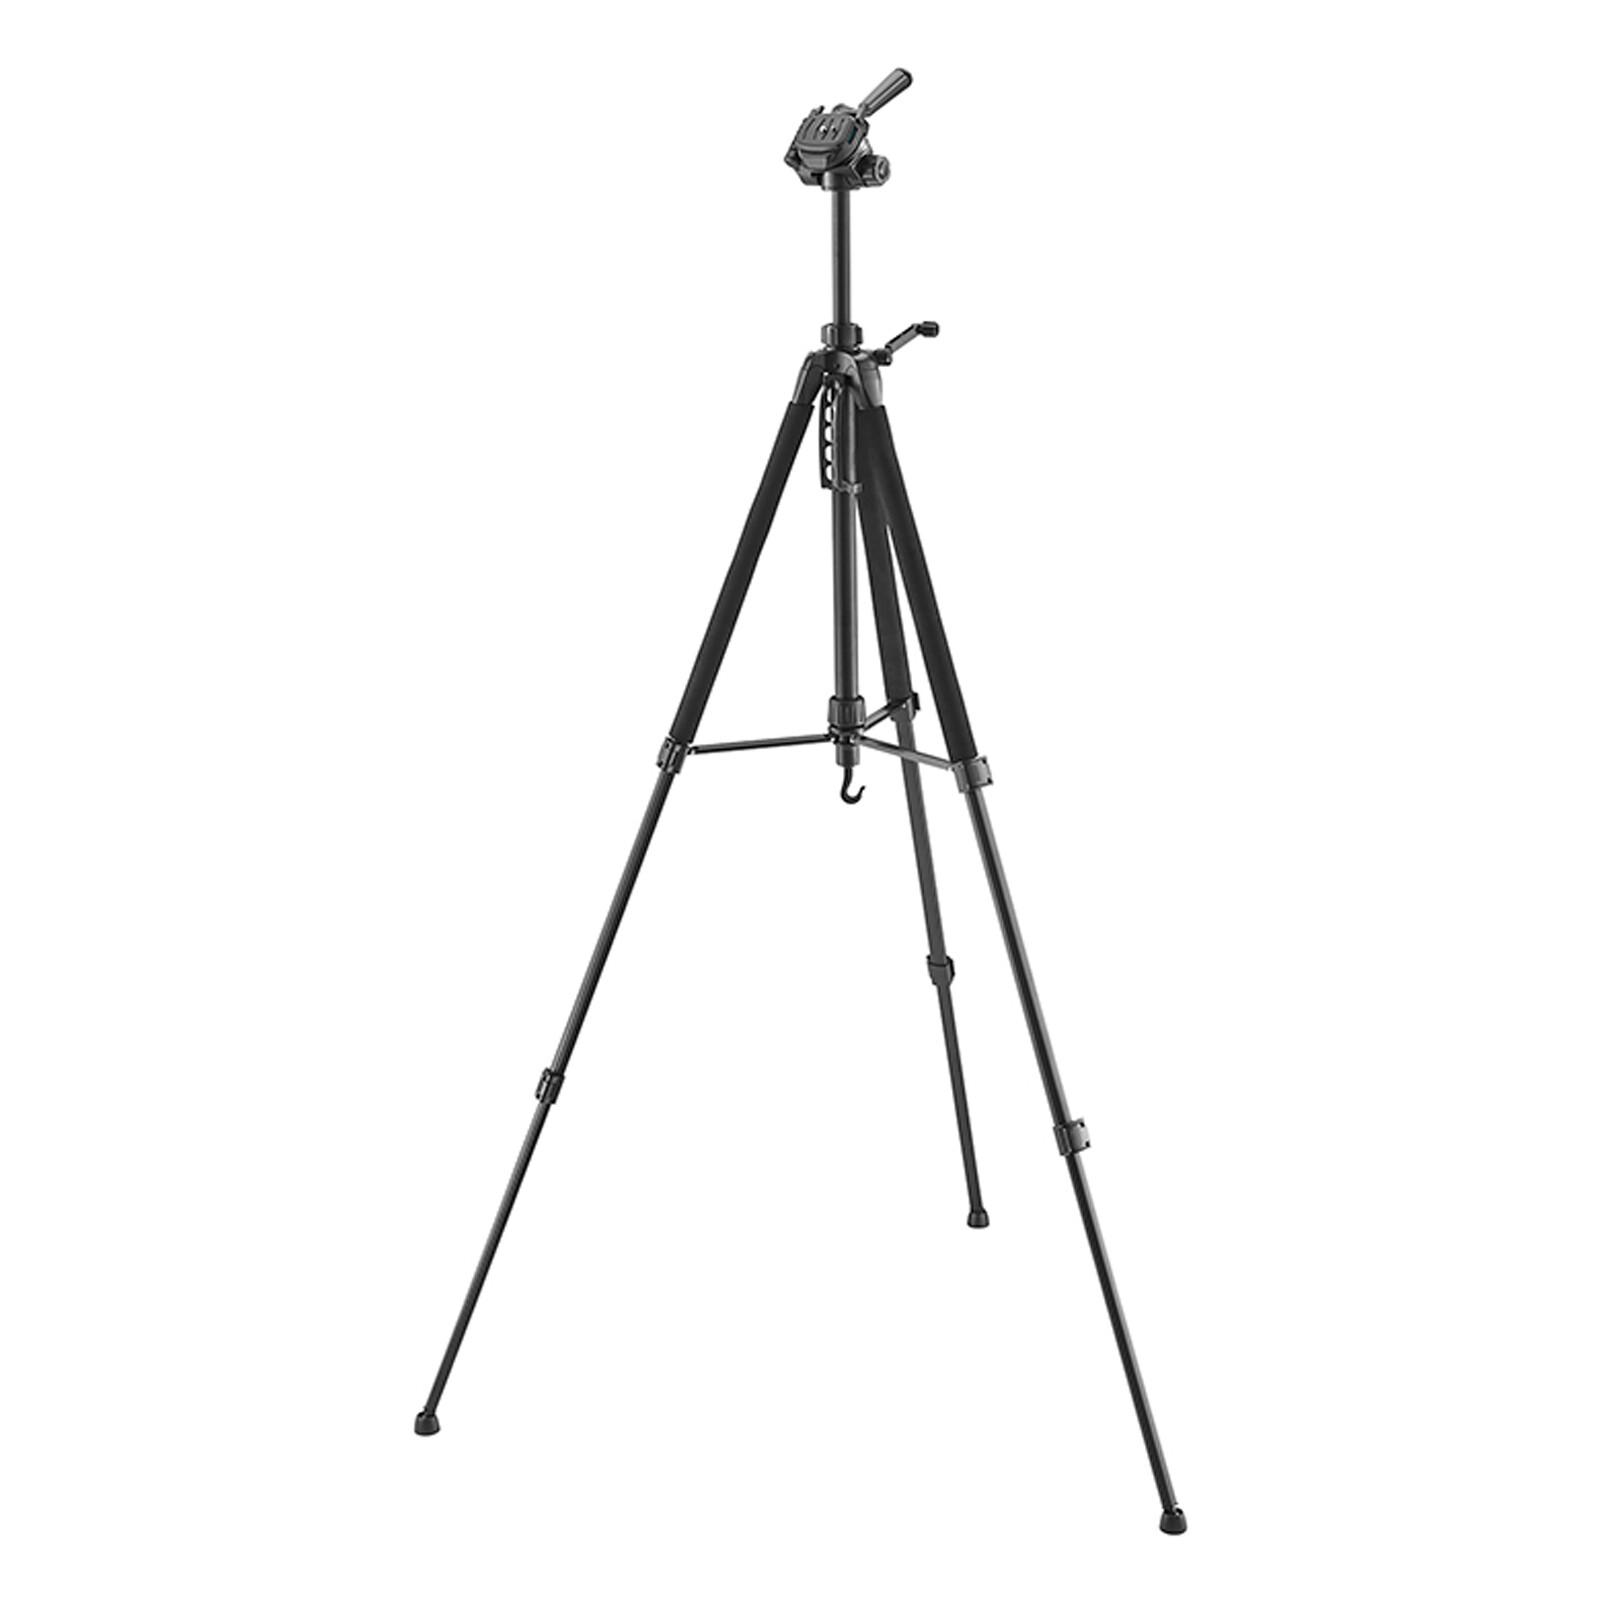 Cullmann Alpha 3500 Stativ schwarz